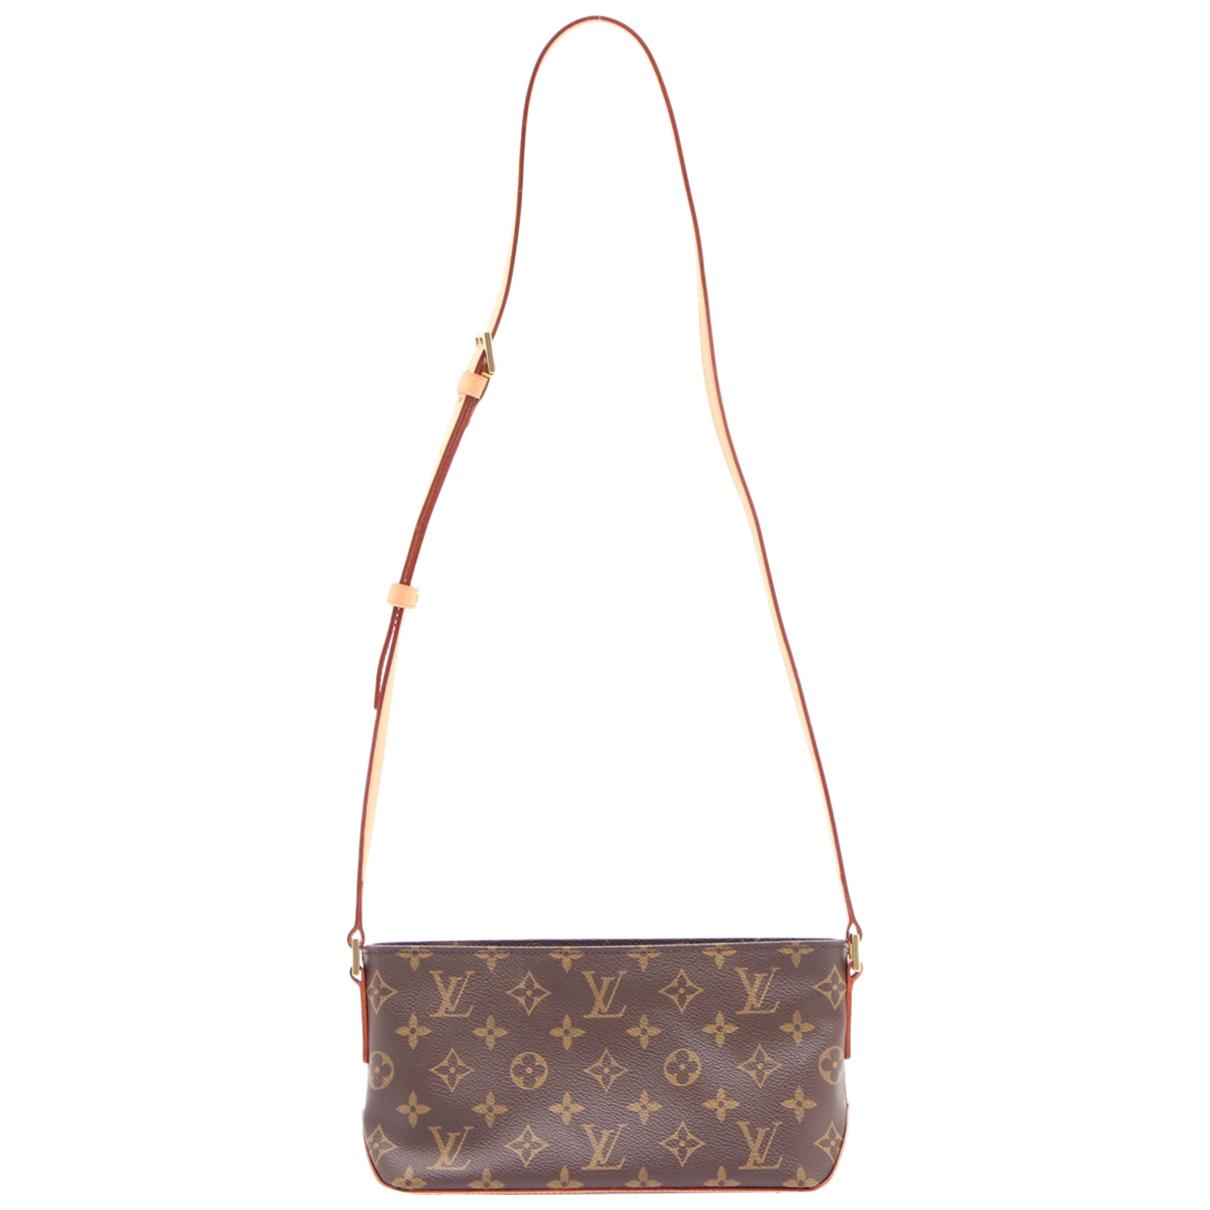 Louis Vuitton Trotteur Cloth handbag for Women N